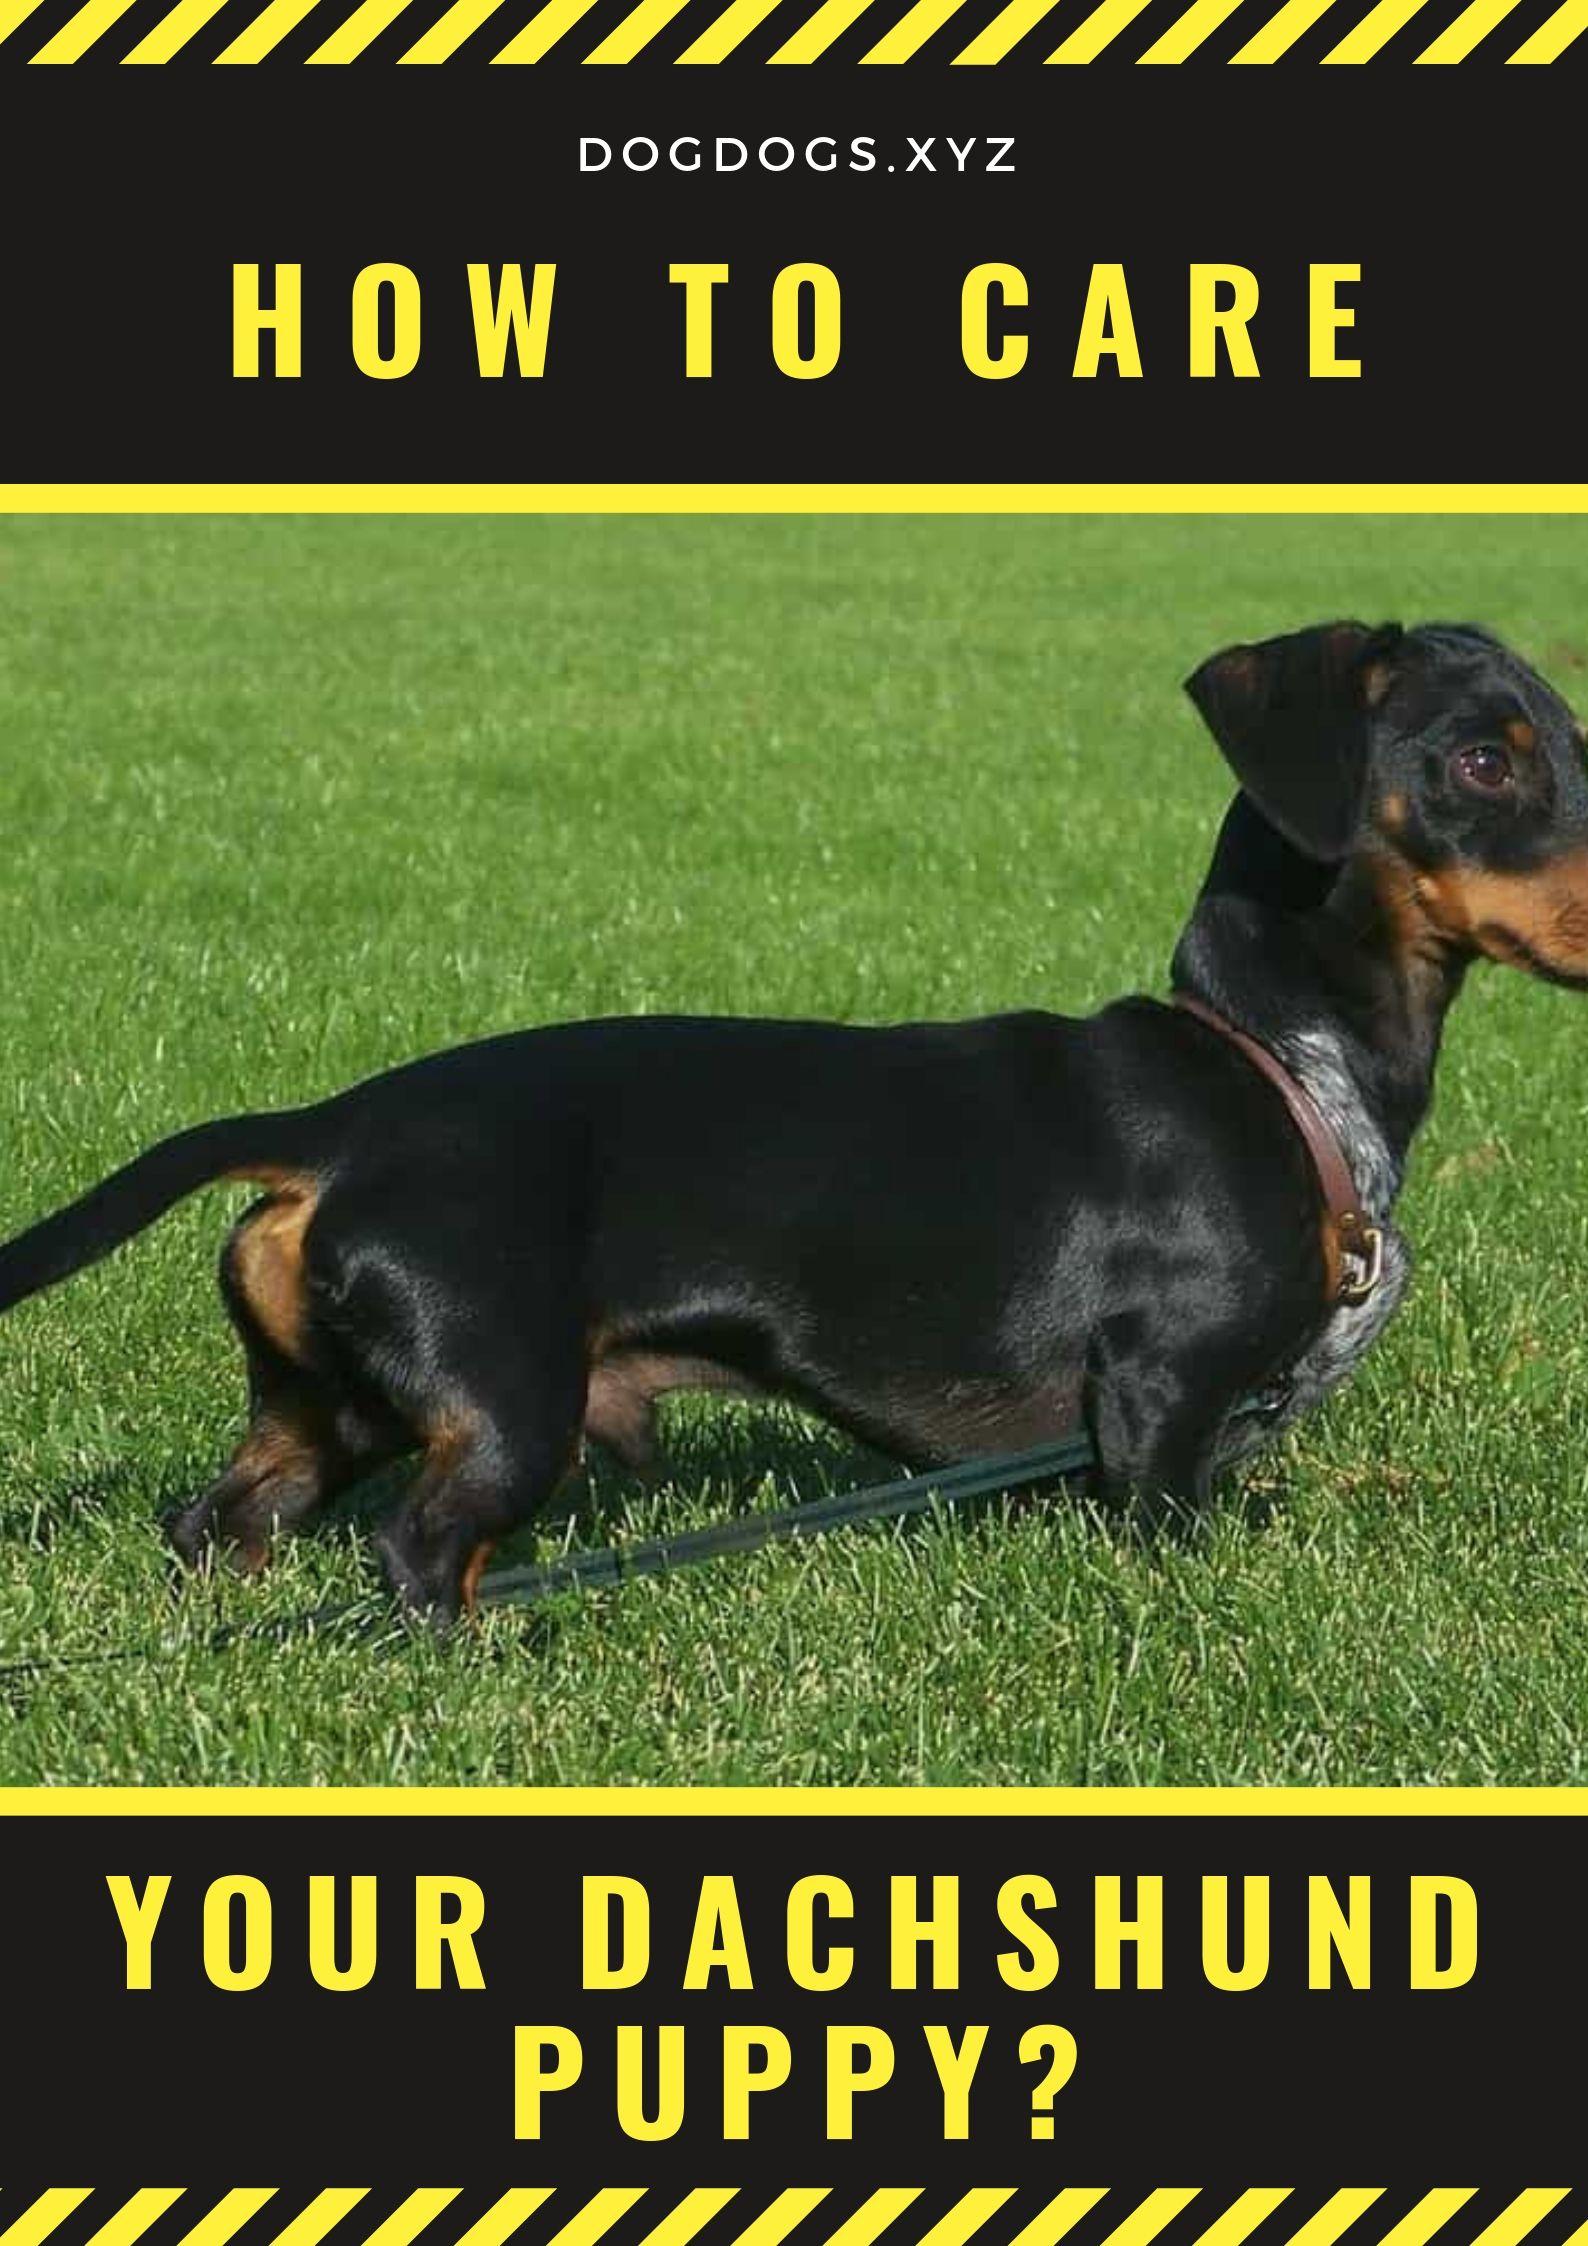 How To Care Your Dachshund Puppy Dachshund Puppy Dachshund